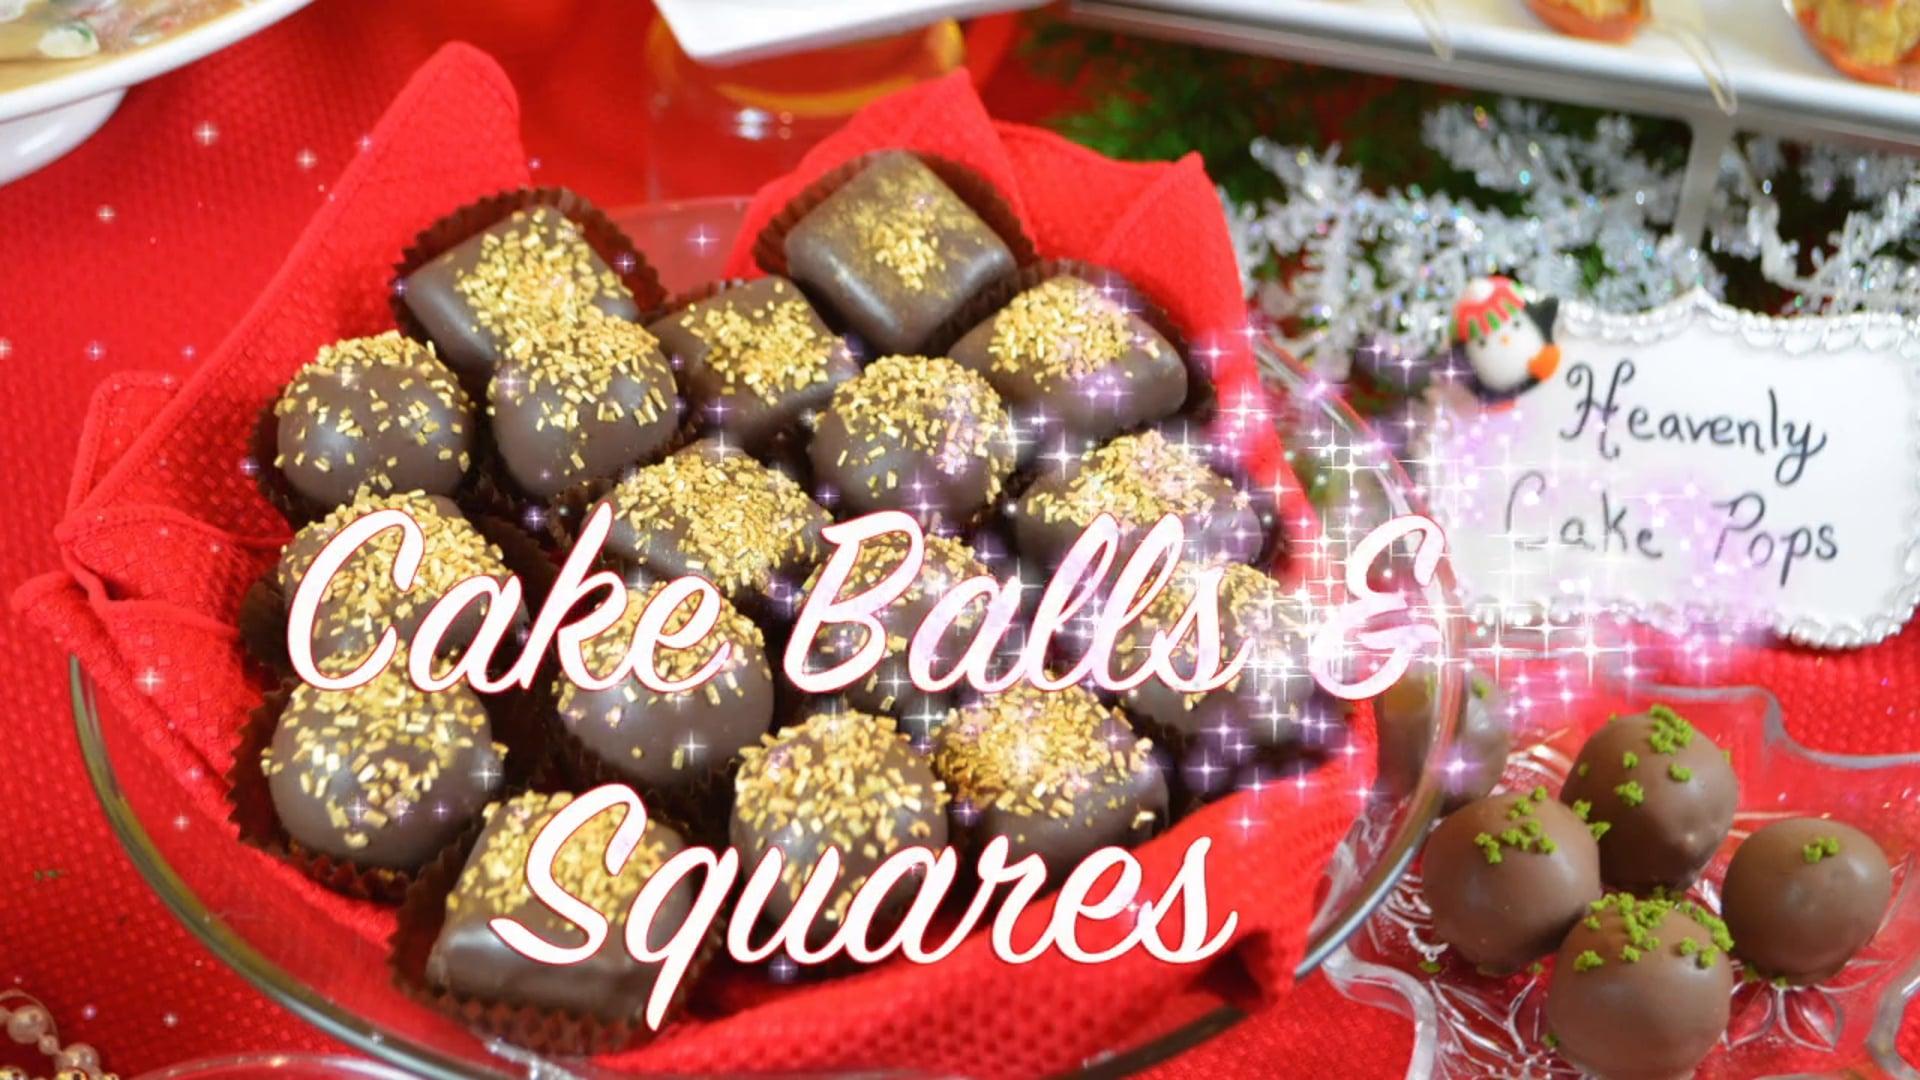 Free Video: How to create Cake Balls & Square Treats